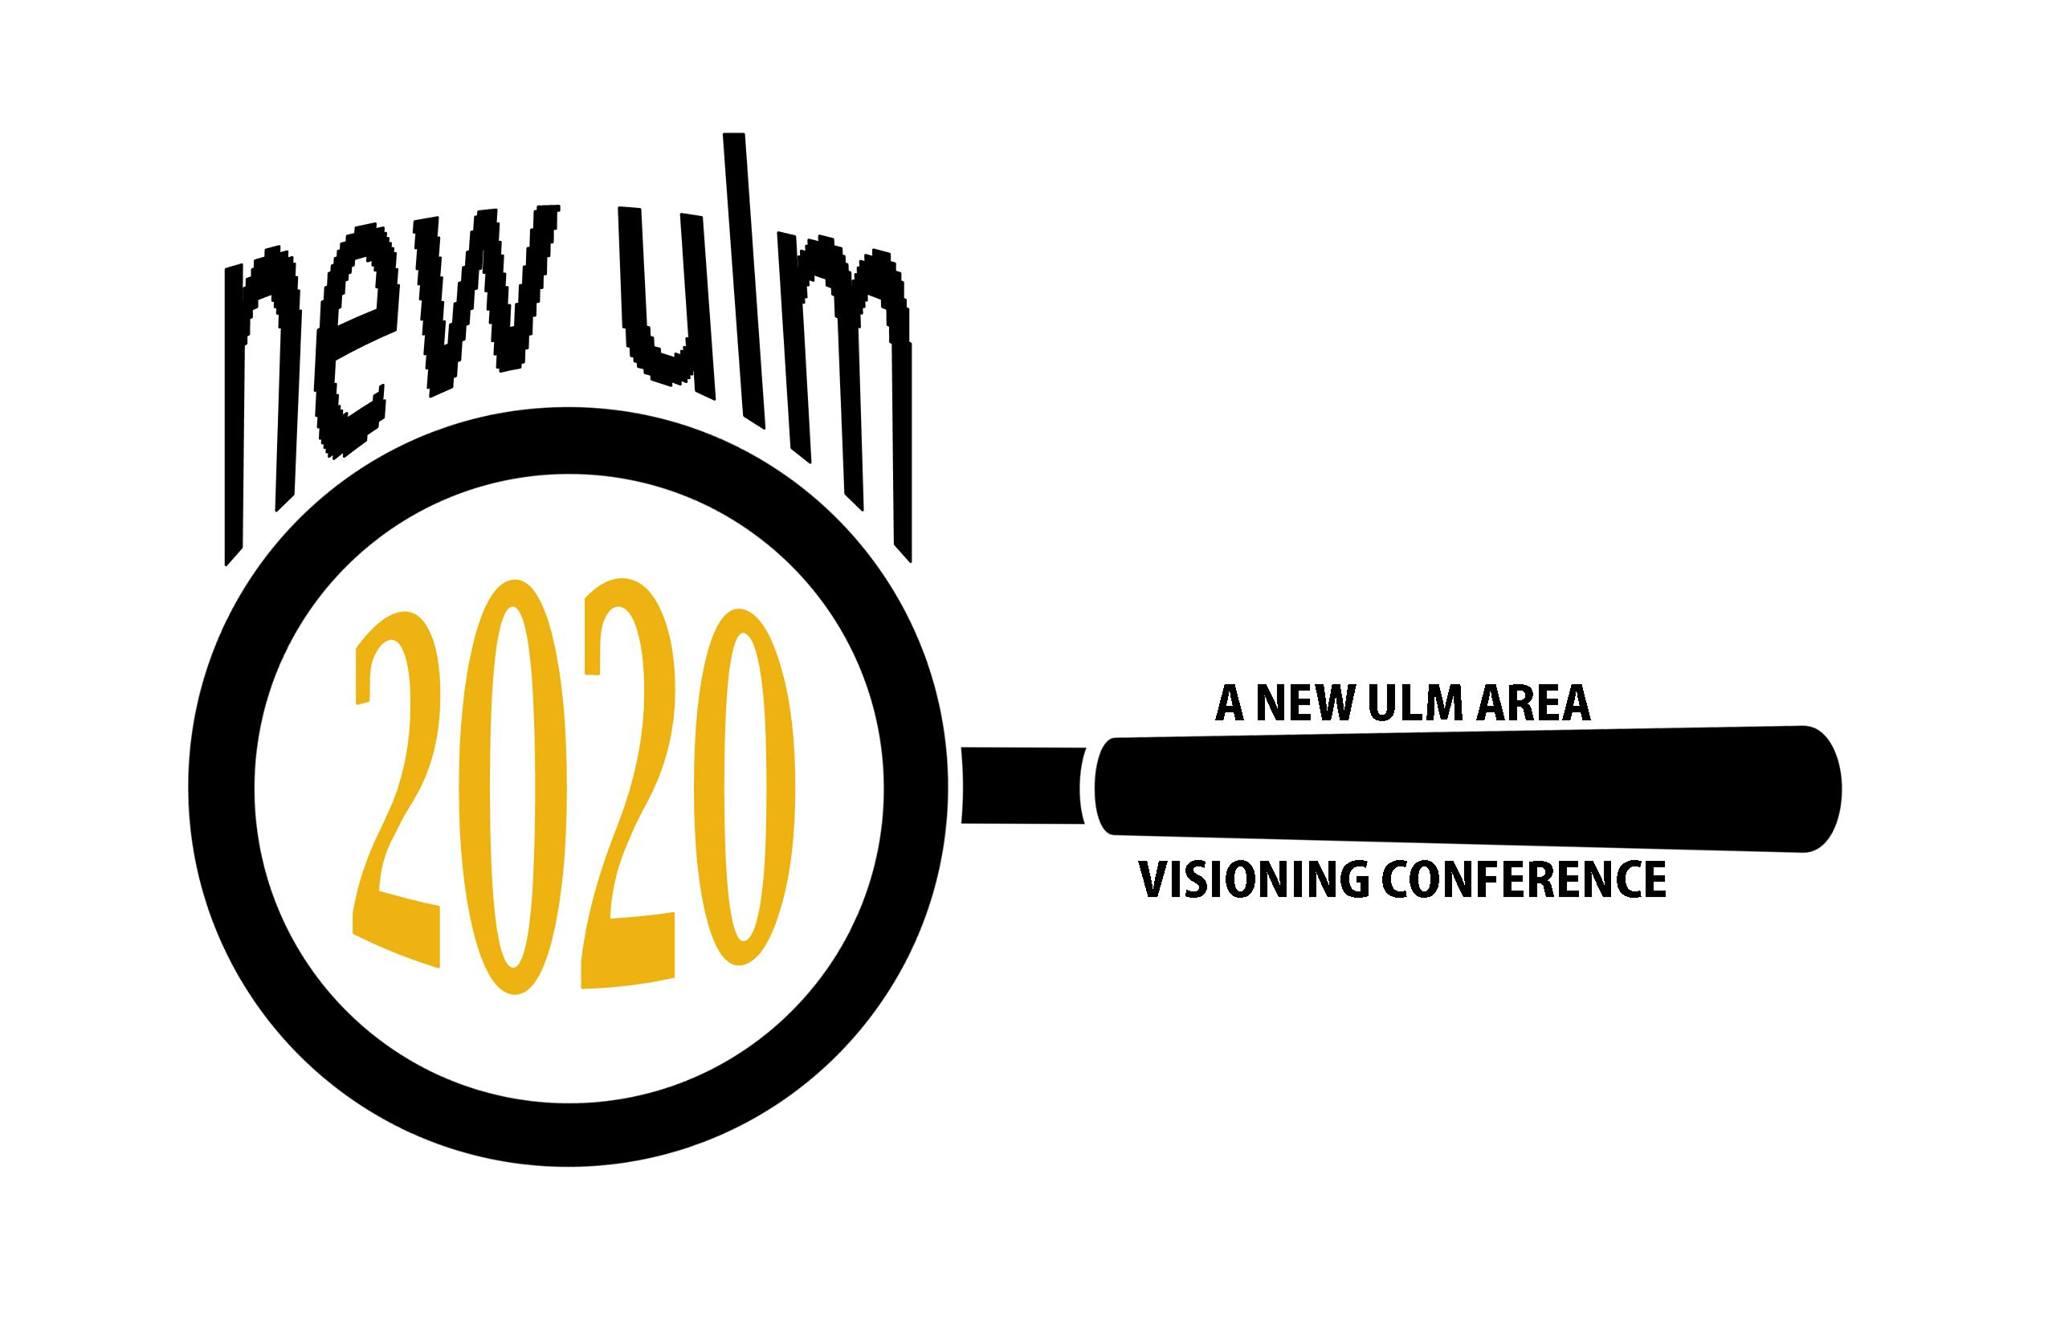 New Ulm 2020 logo